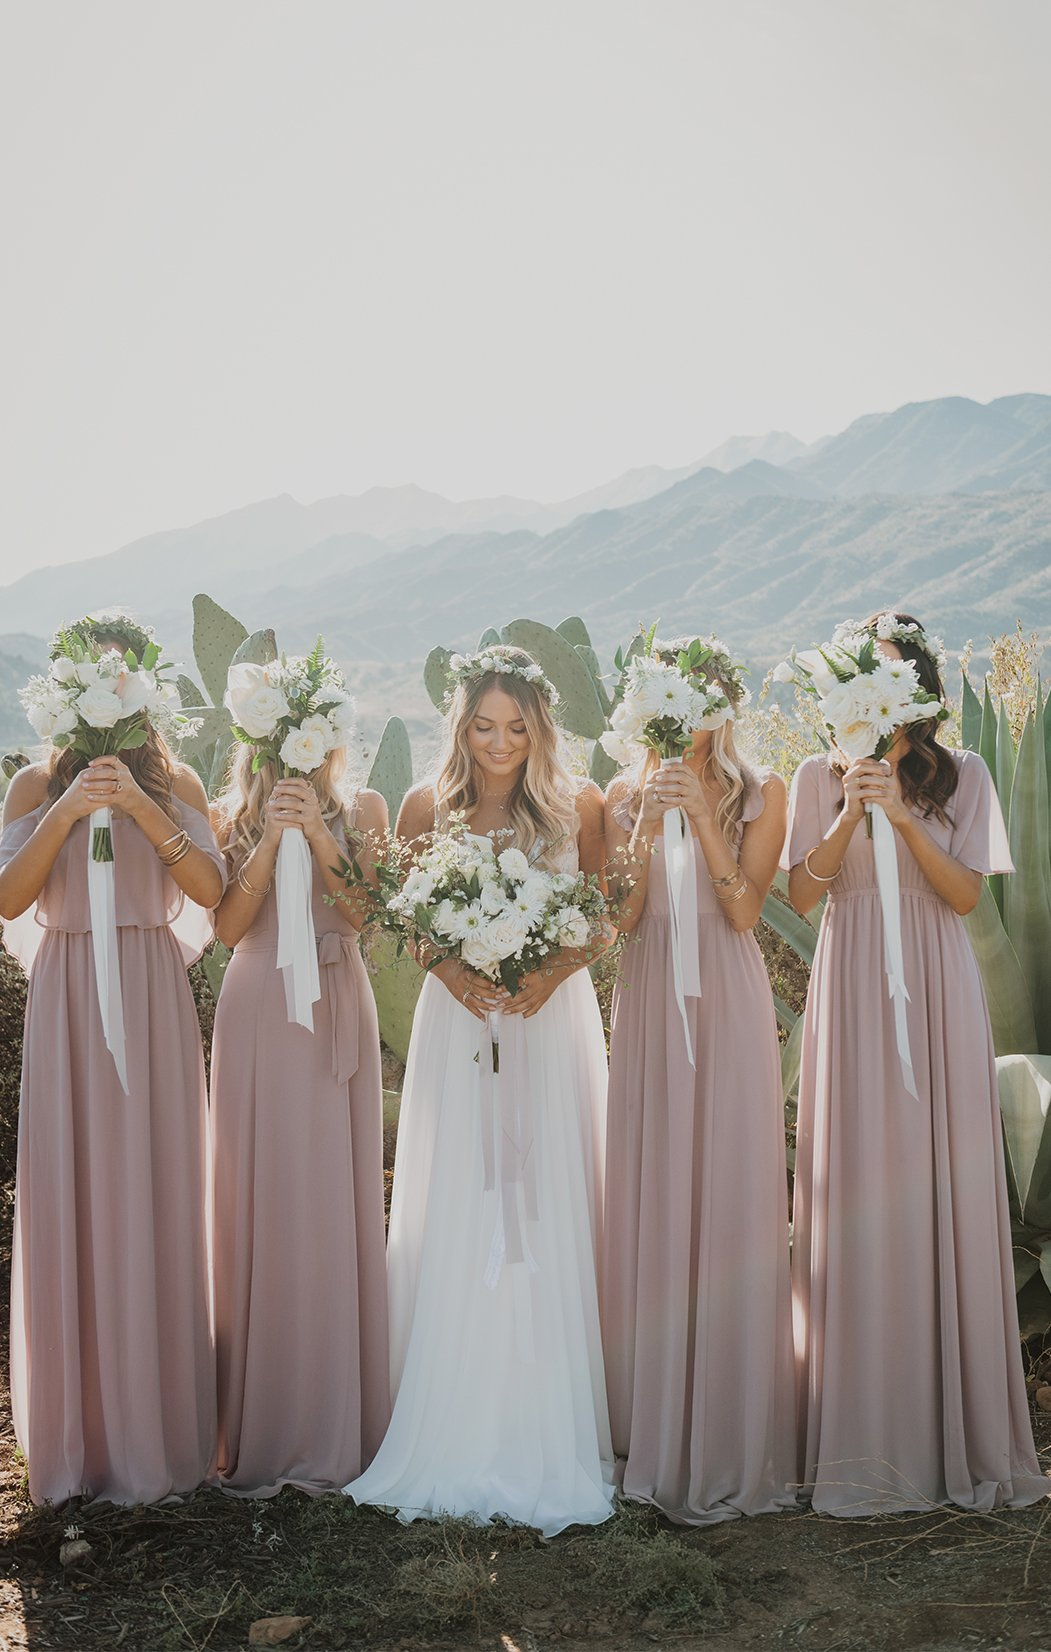 bridesmaid dresses, bridesmaid dress ideas, bridesmaid dress colors, bridesmaid dress styles, affordable bridesmaid dress, mauve bridesmaid dress, maxi bridesmaid dress